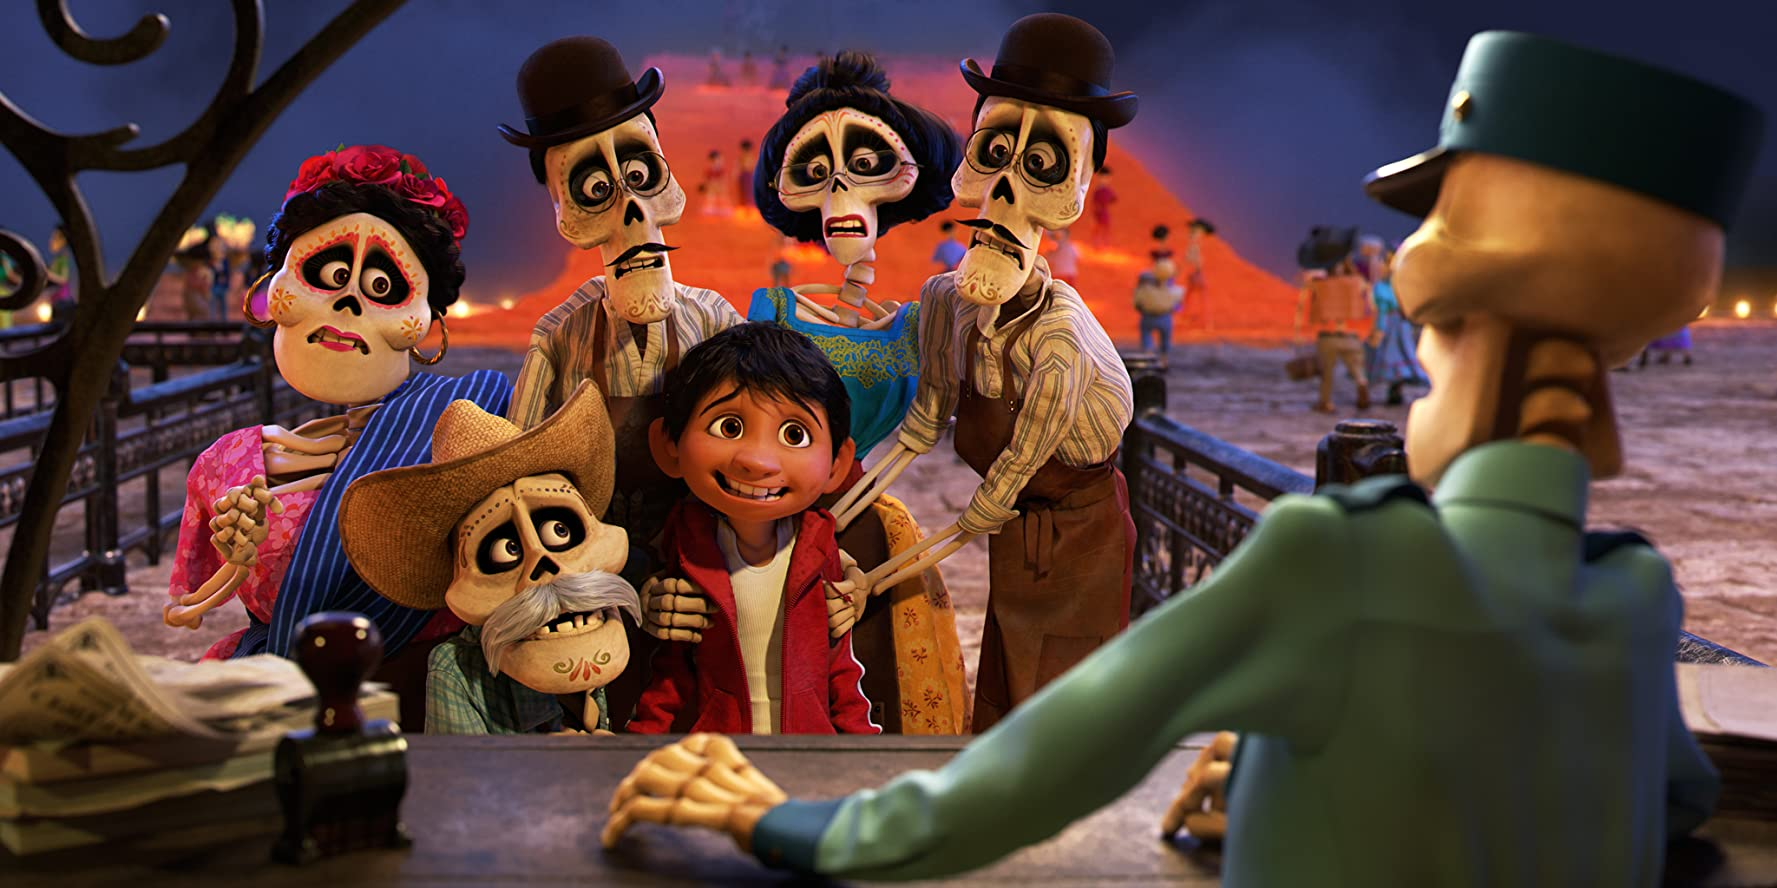 Alfonso Arau, Selene Luna, Dyana Ortelli, Herbert Siguenza, and Anthony Gonzalez in Coco (2017)